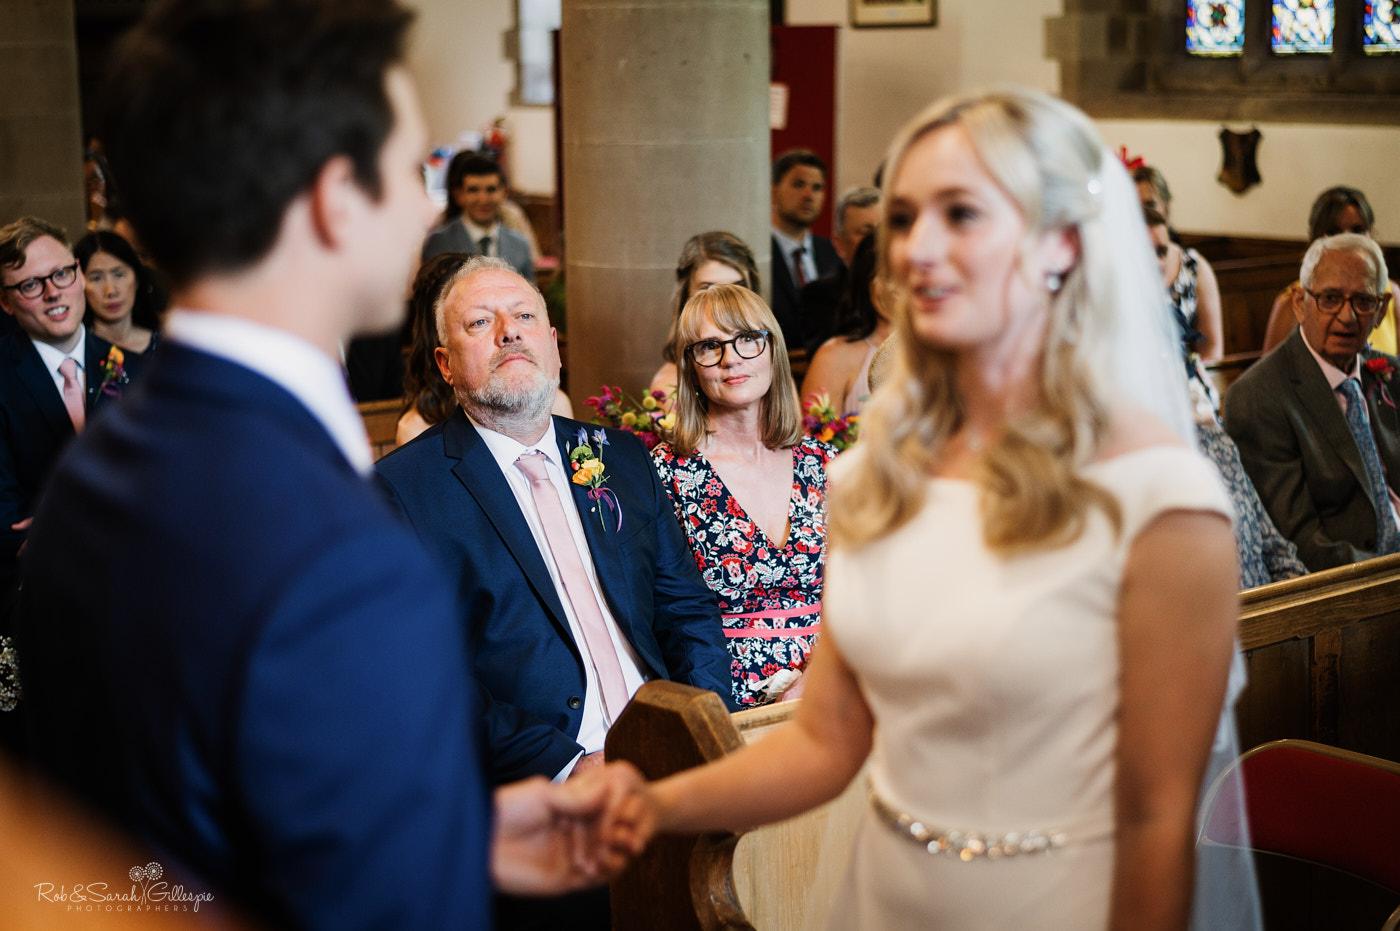 Bride's parents watch wedding ceremony at St Leonard's church Clent